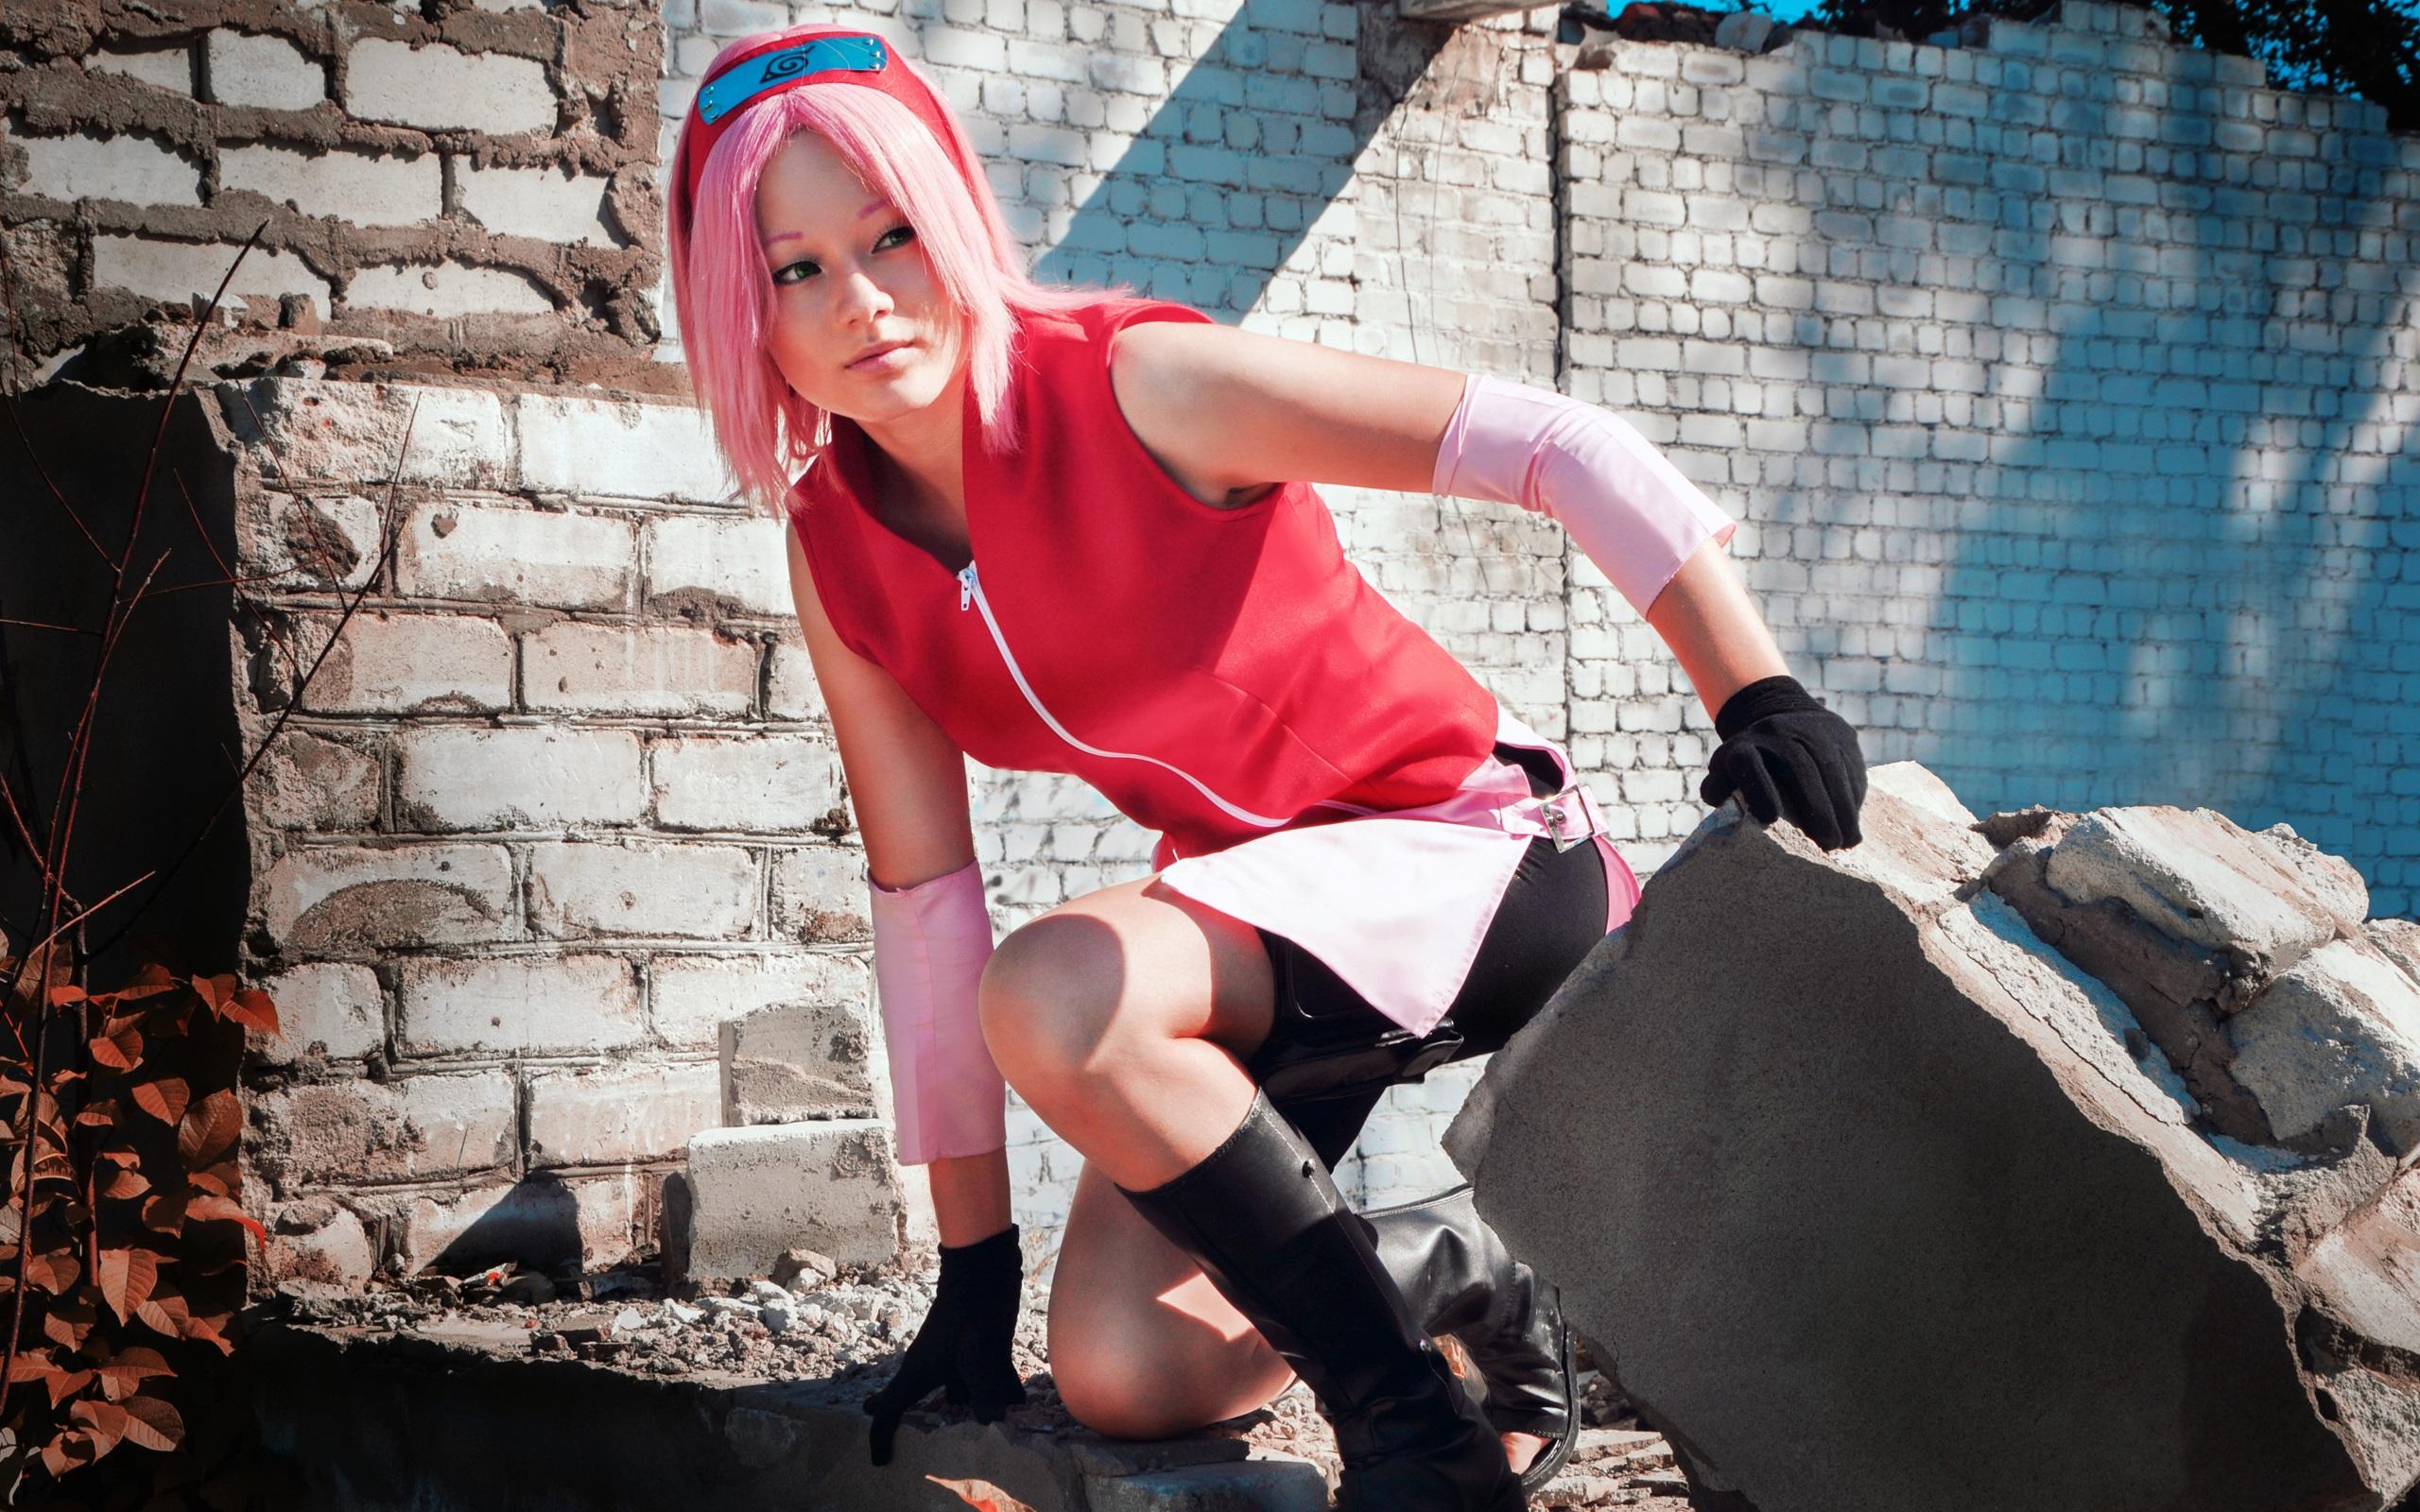 Cosplay Pubg Girl Hd Wallpaper: 배경 화면 코스프레 소녀, 나루토 2560x1600 HD 그림, 이미지